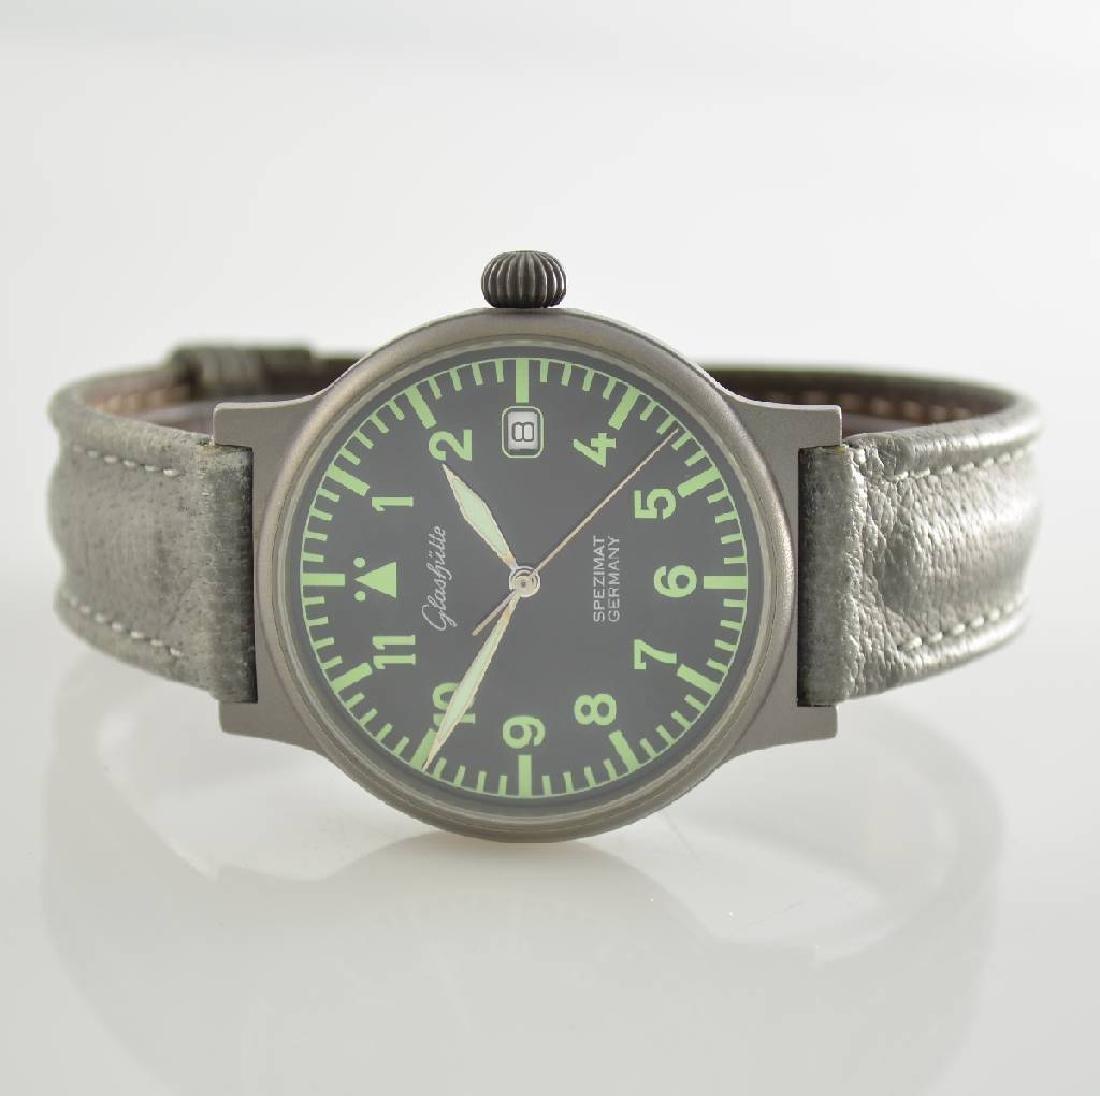 GLASHUTTE gents wristwatch Spezimat in pilot design